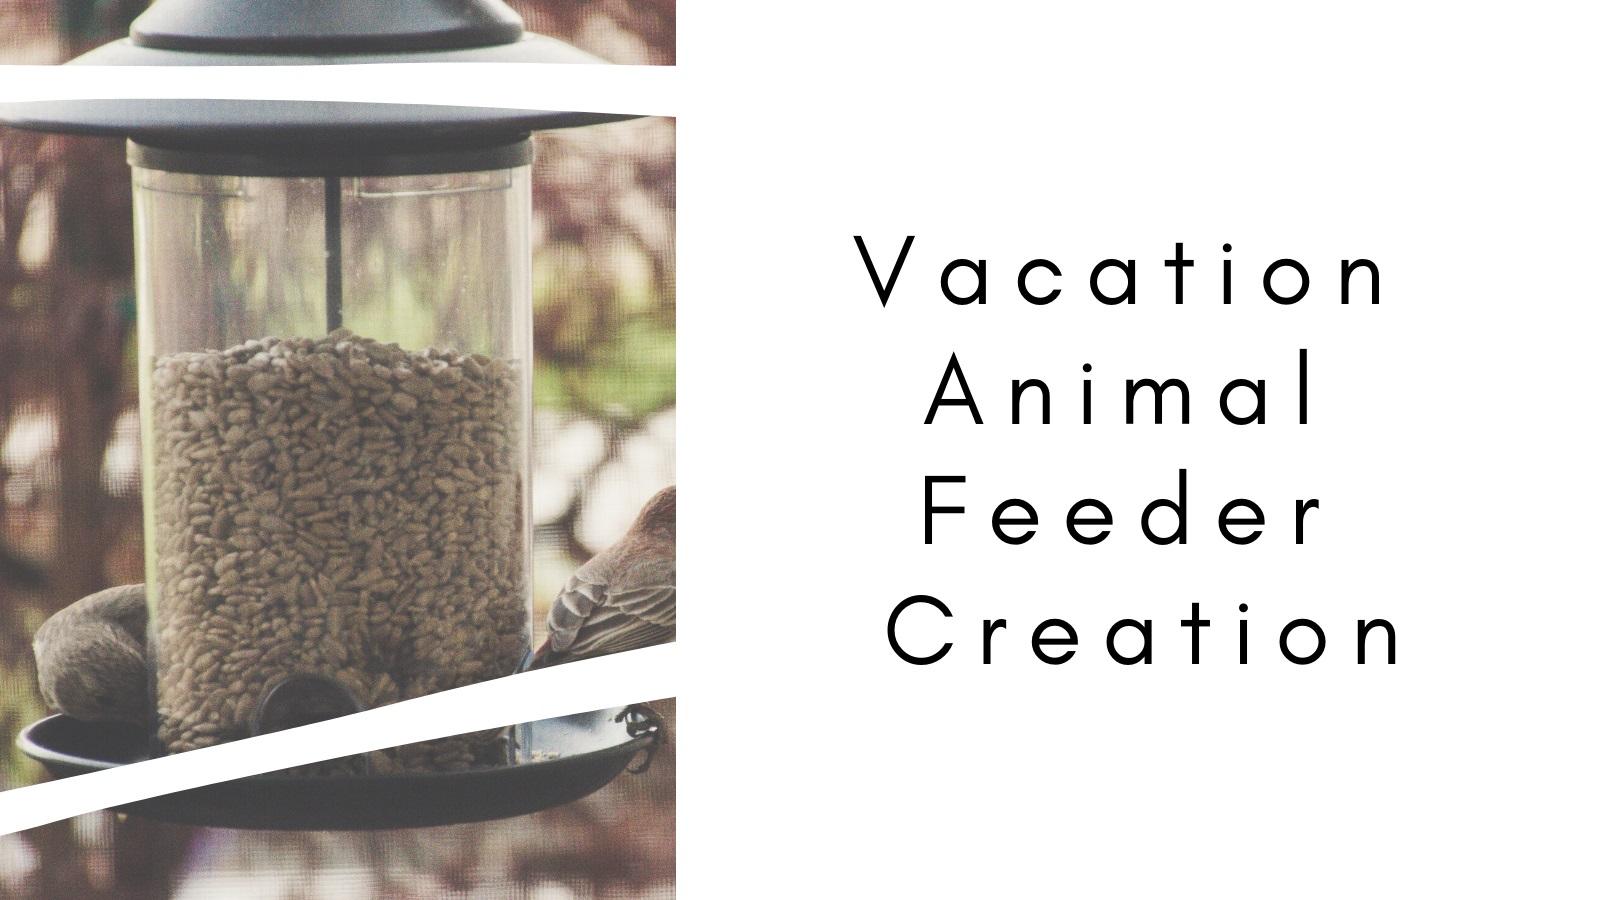 Vacation Animal Feeder